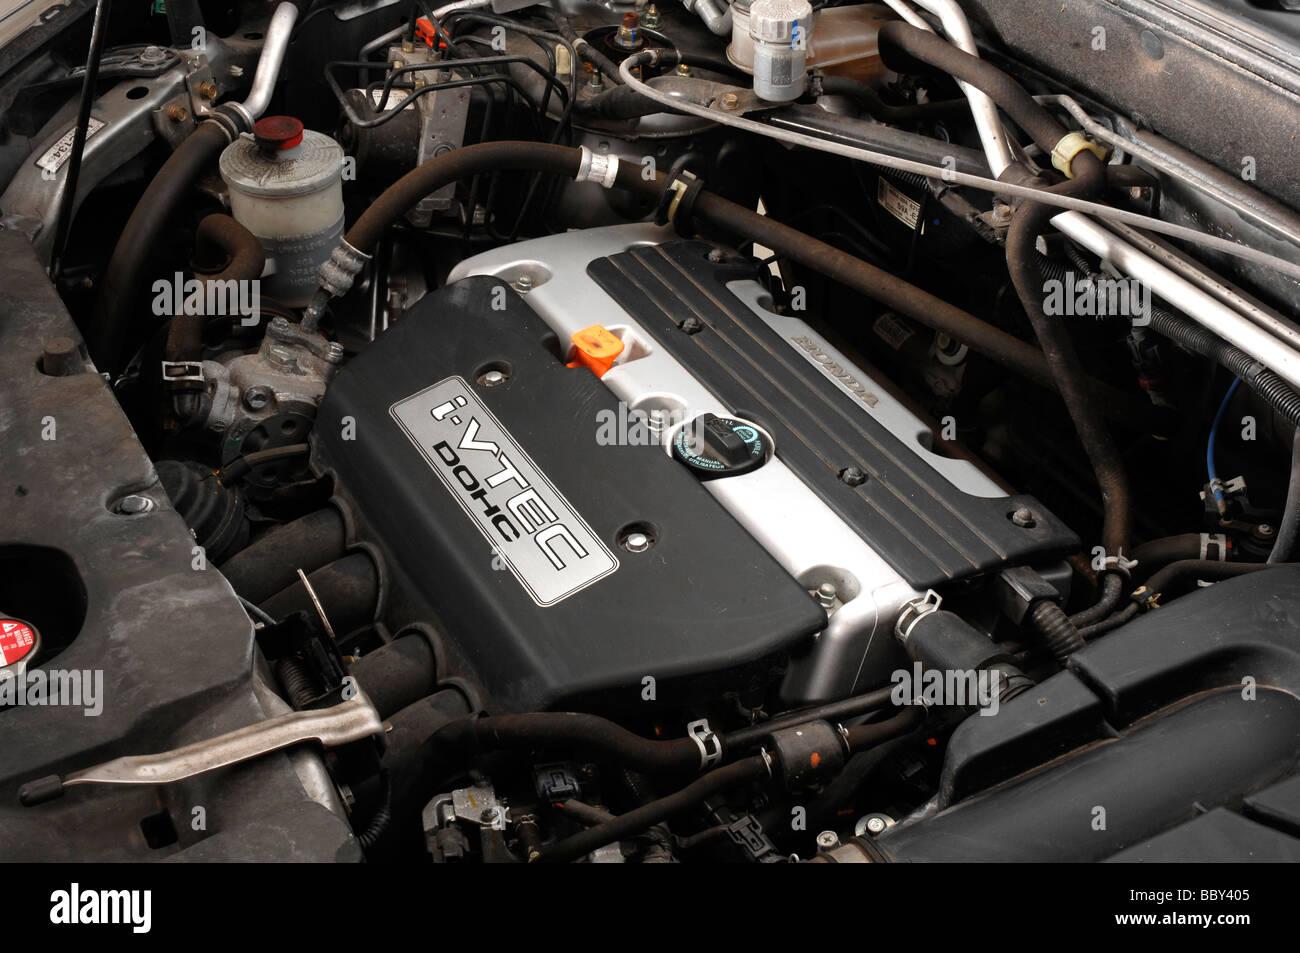 Honda CRV 2005 - Stock Image